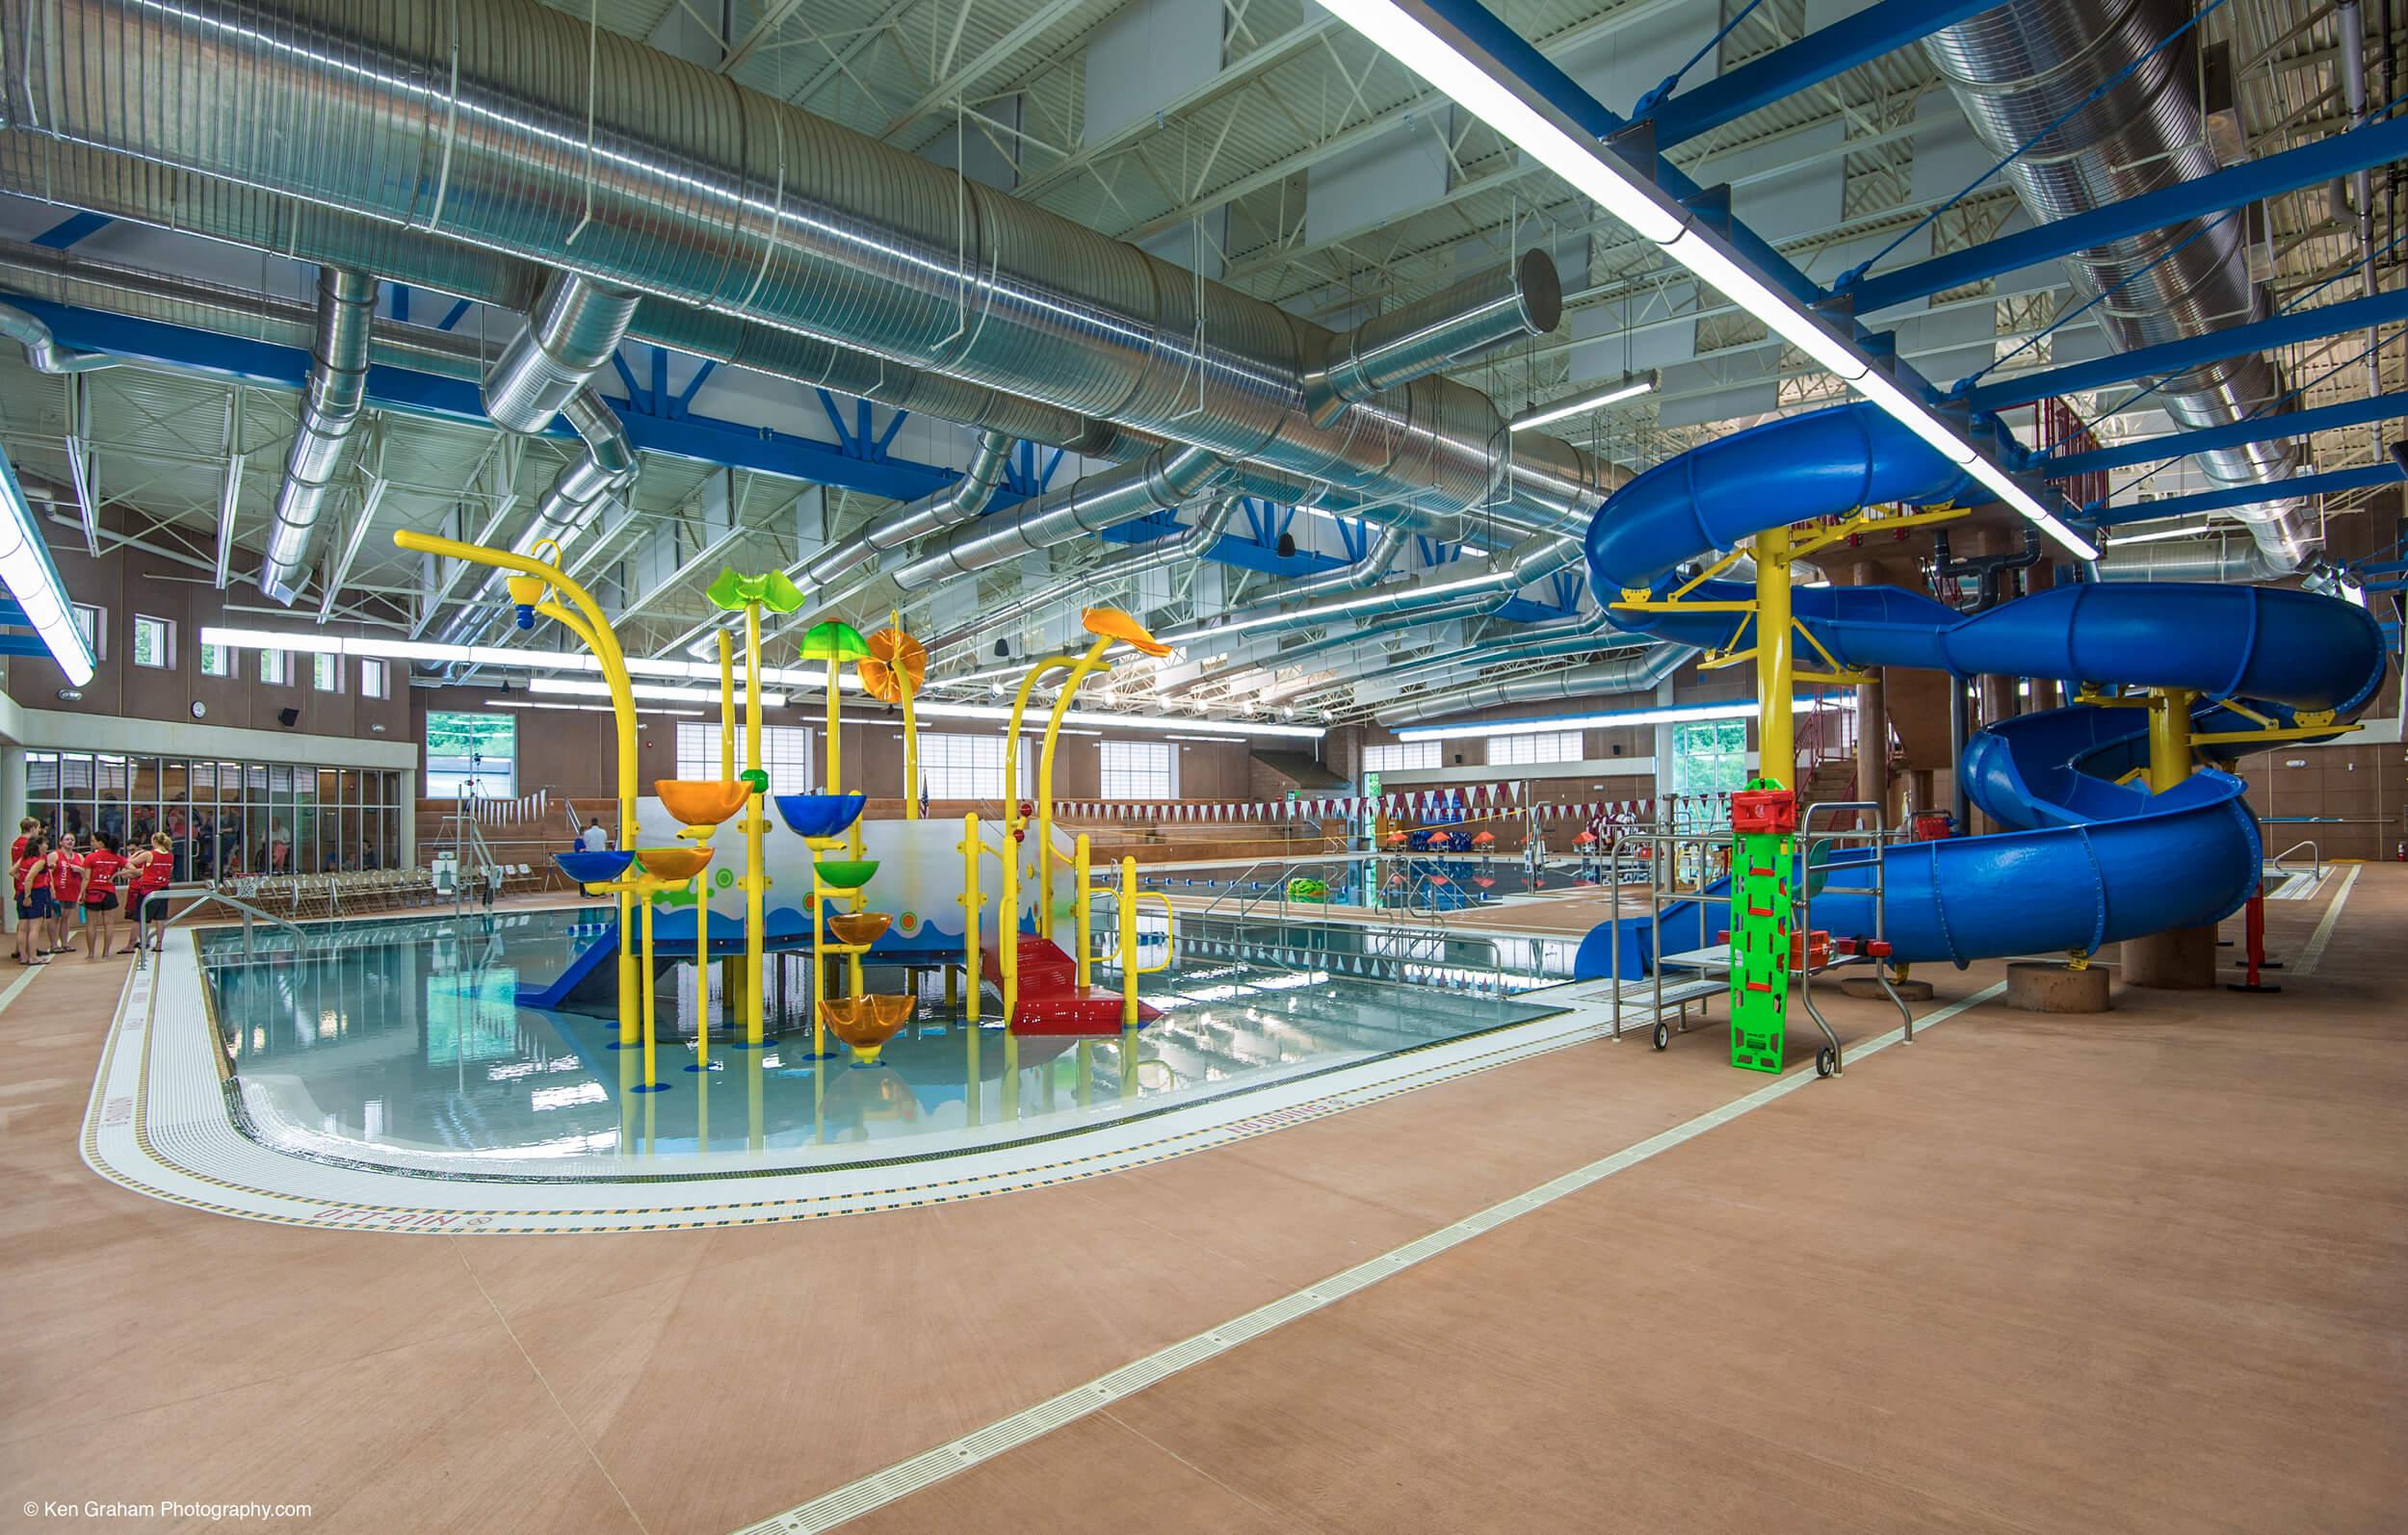 Expand Ketchikan Aquatic Center Water SLides